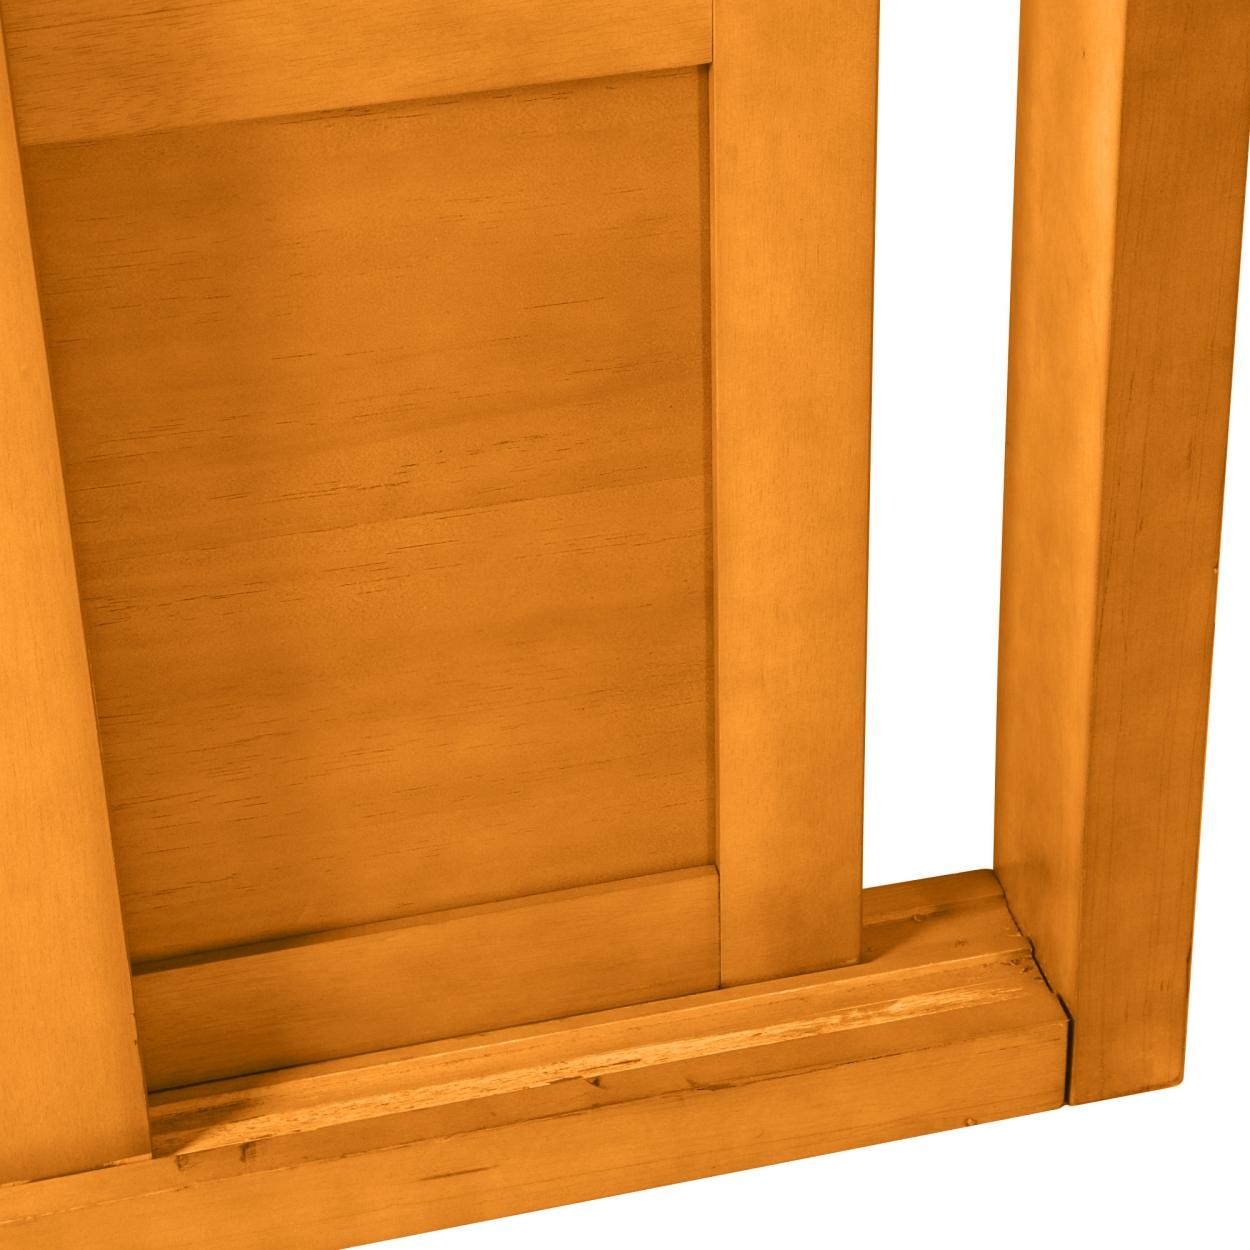 Tall Zen Shoji Sliding Door Kit. $779.00. Tap To Expand